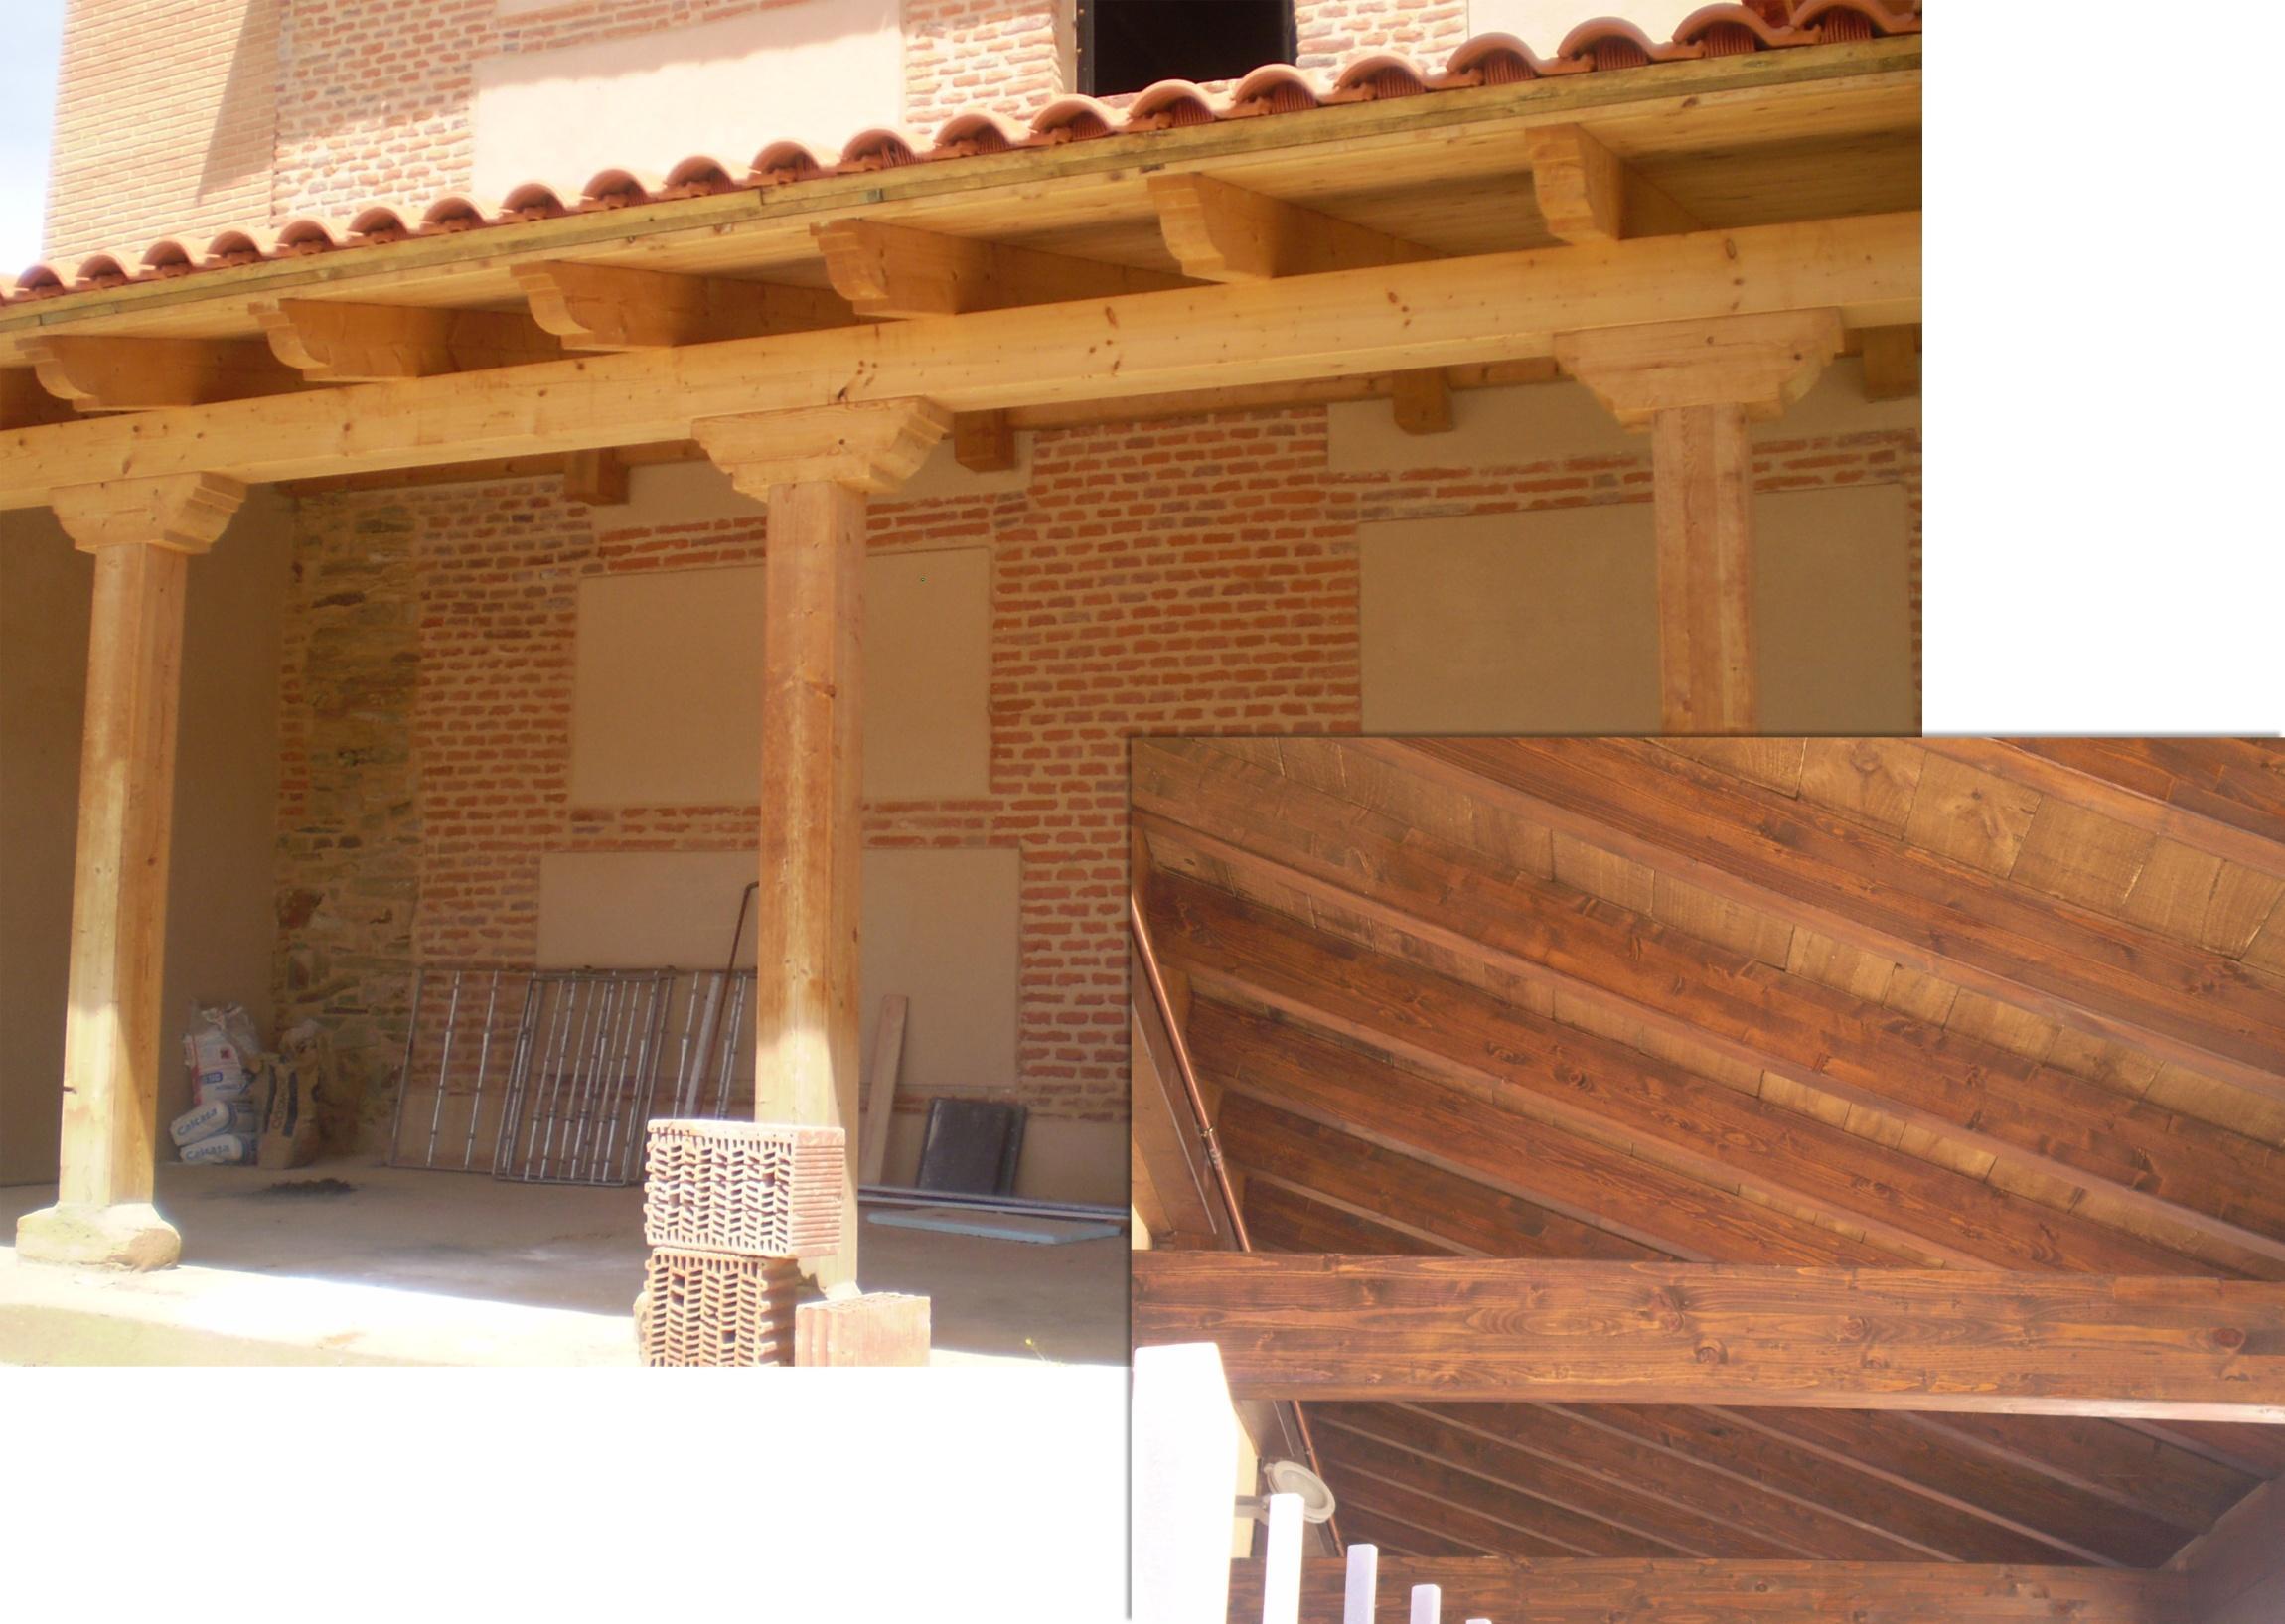 Estructuras de madera para tejados cheap estructura para cenador with estructuras de madera - Estructuras de madera para tejados ...